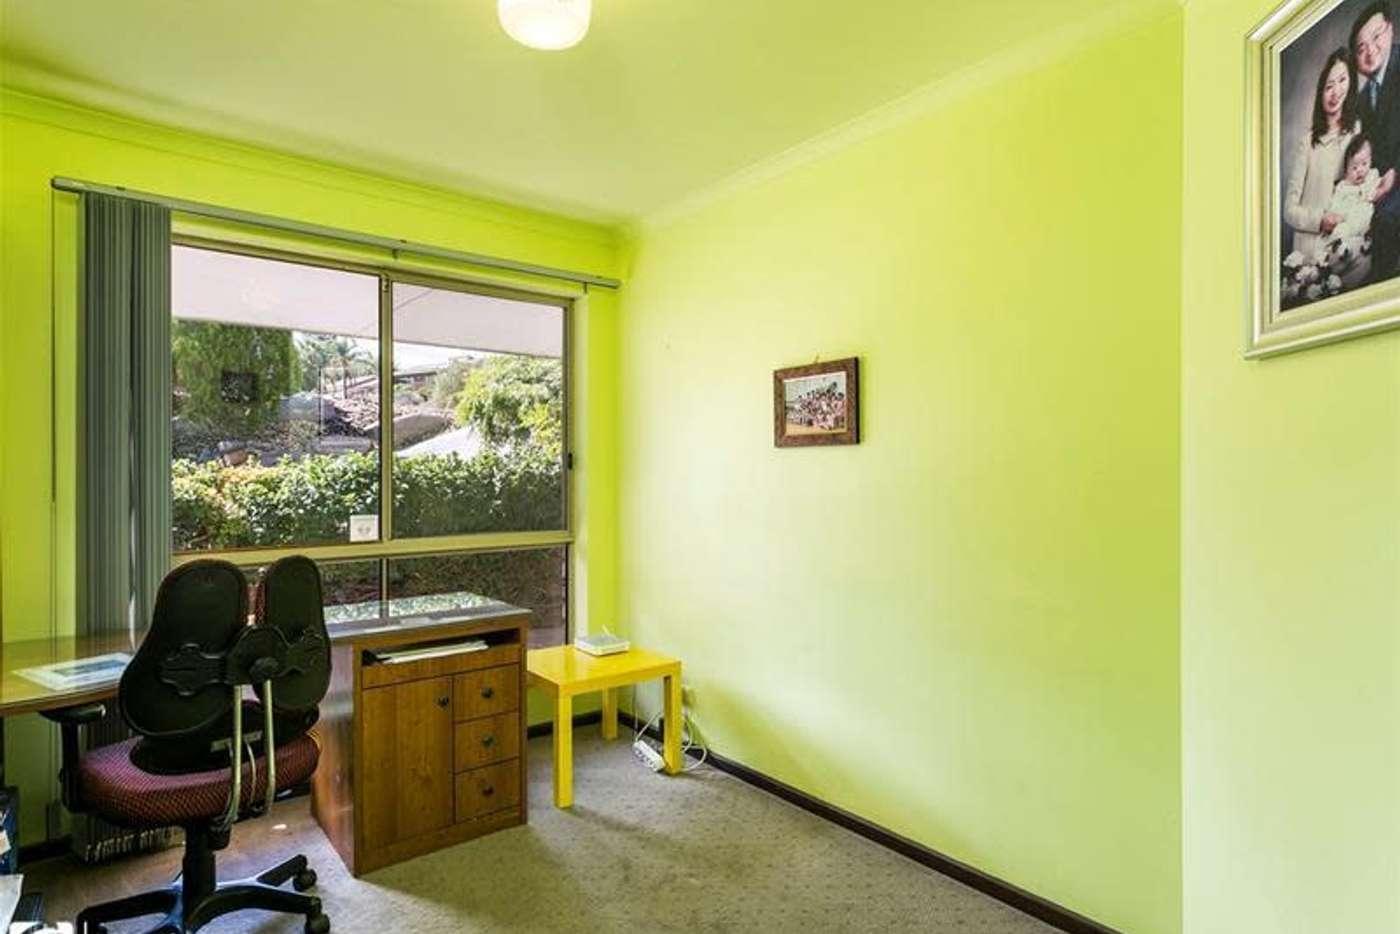 Sixth view of Homely house listing, 1 Karkoo Street, Seaview Downs SA 5049